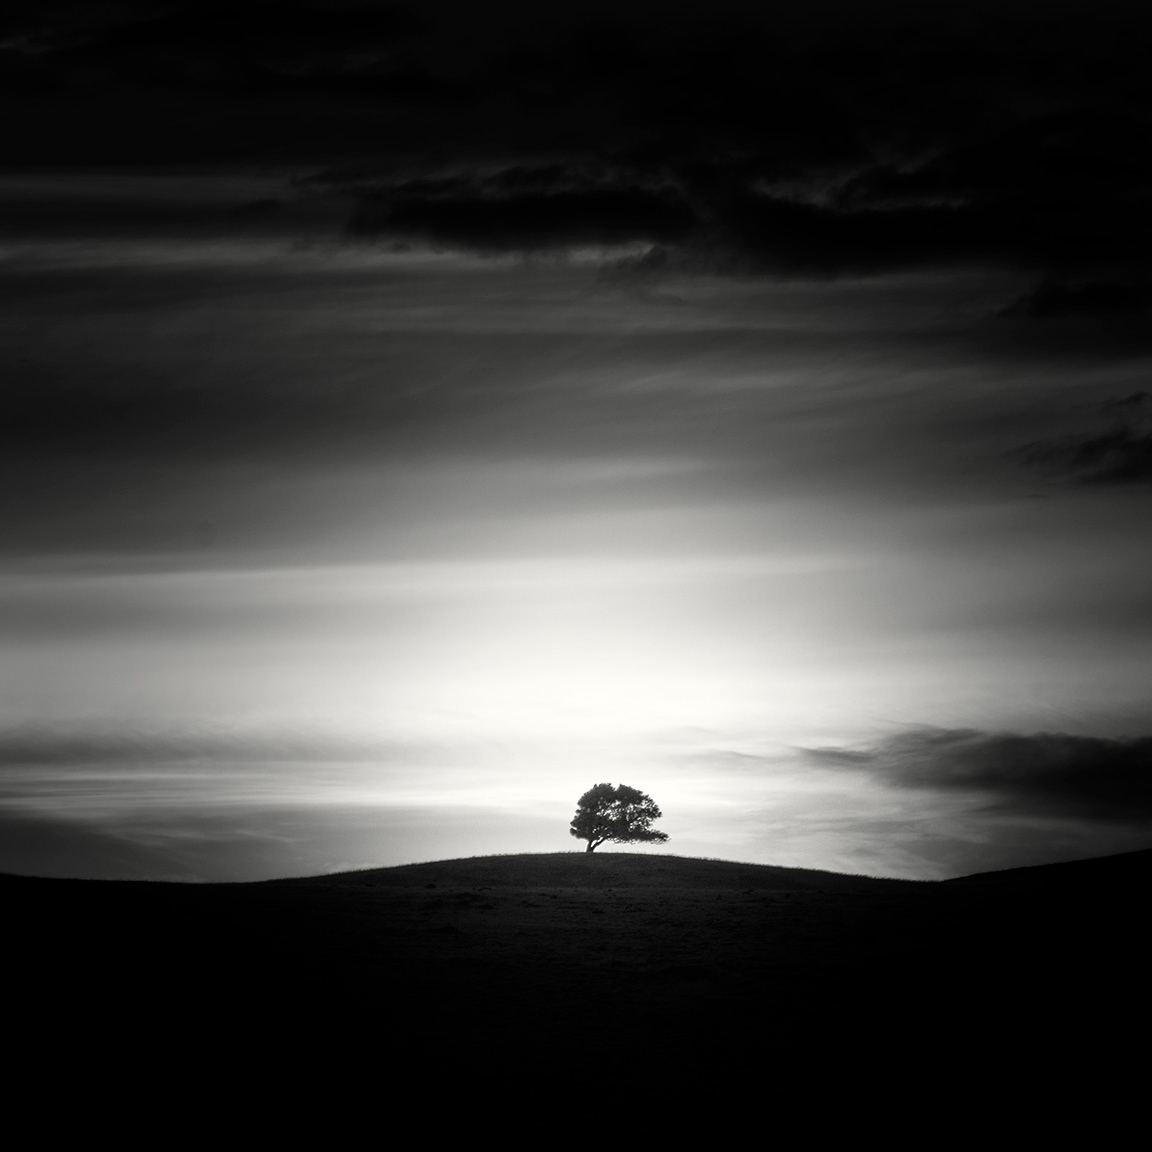 tree hill - nlwirth | ello